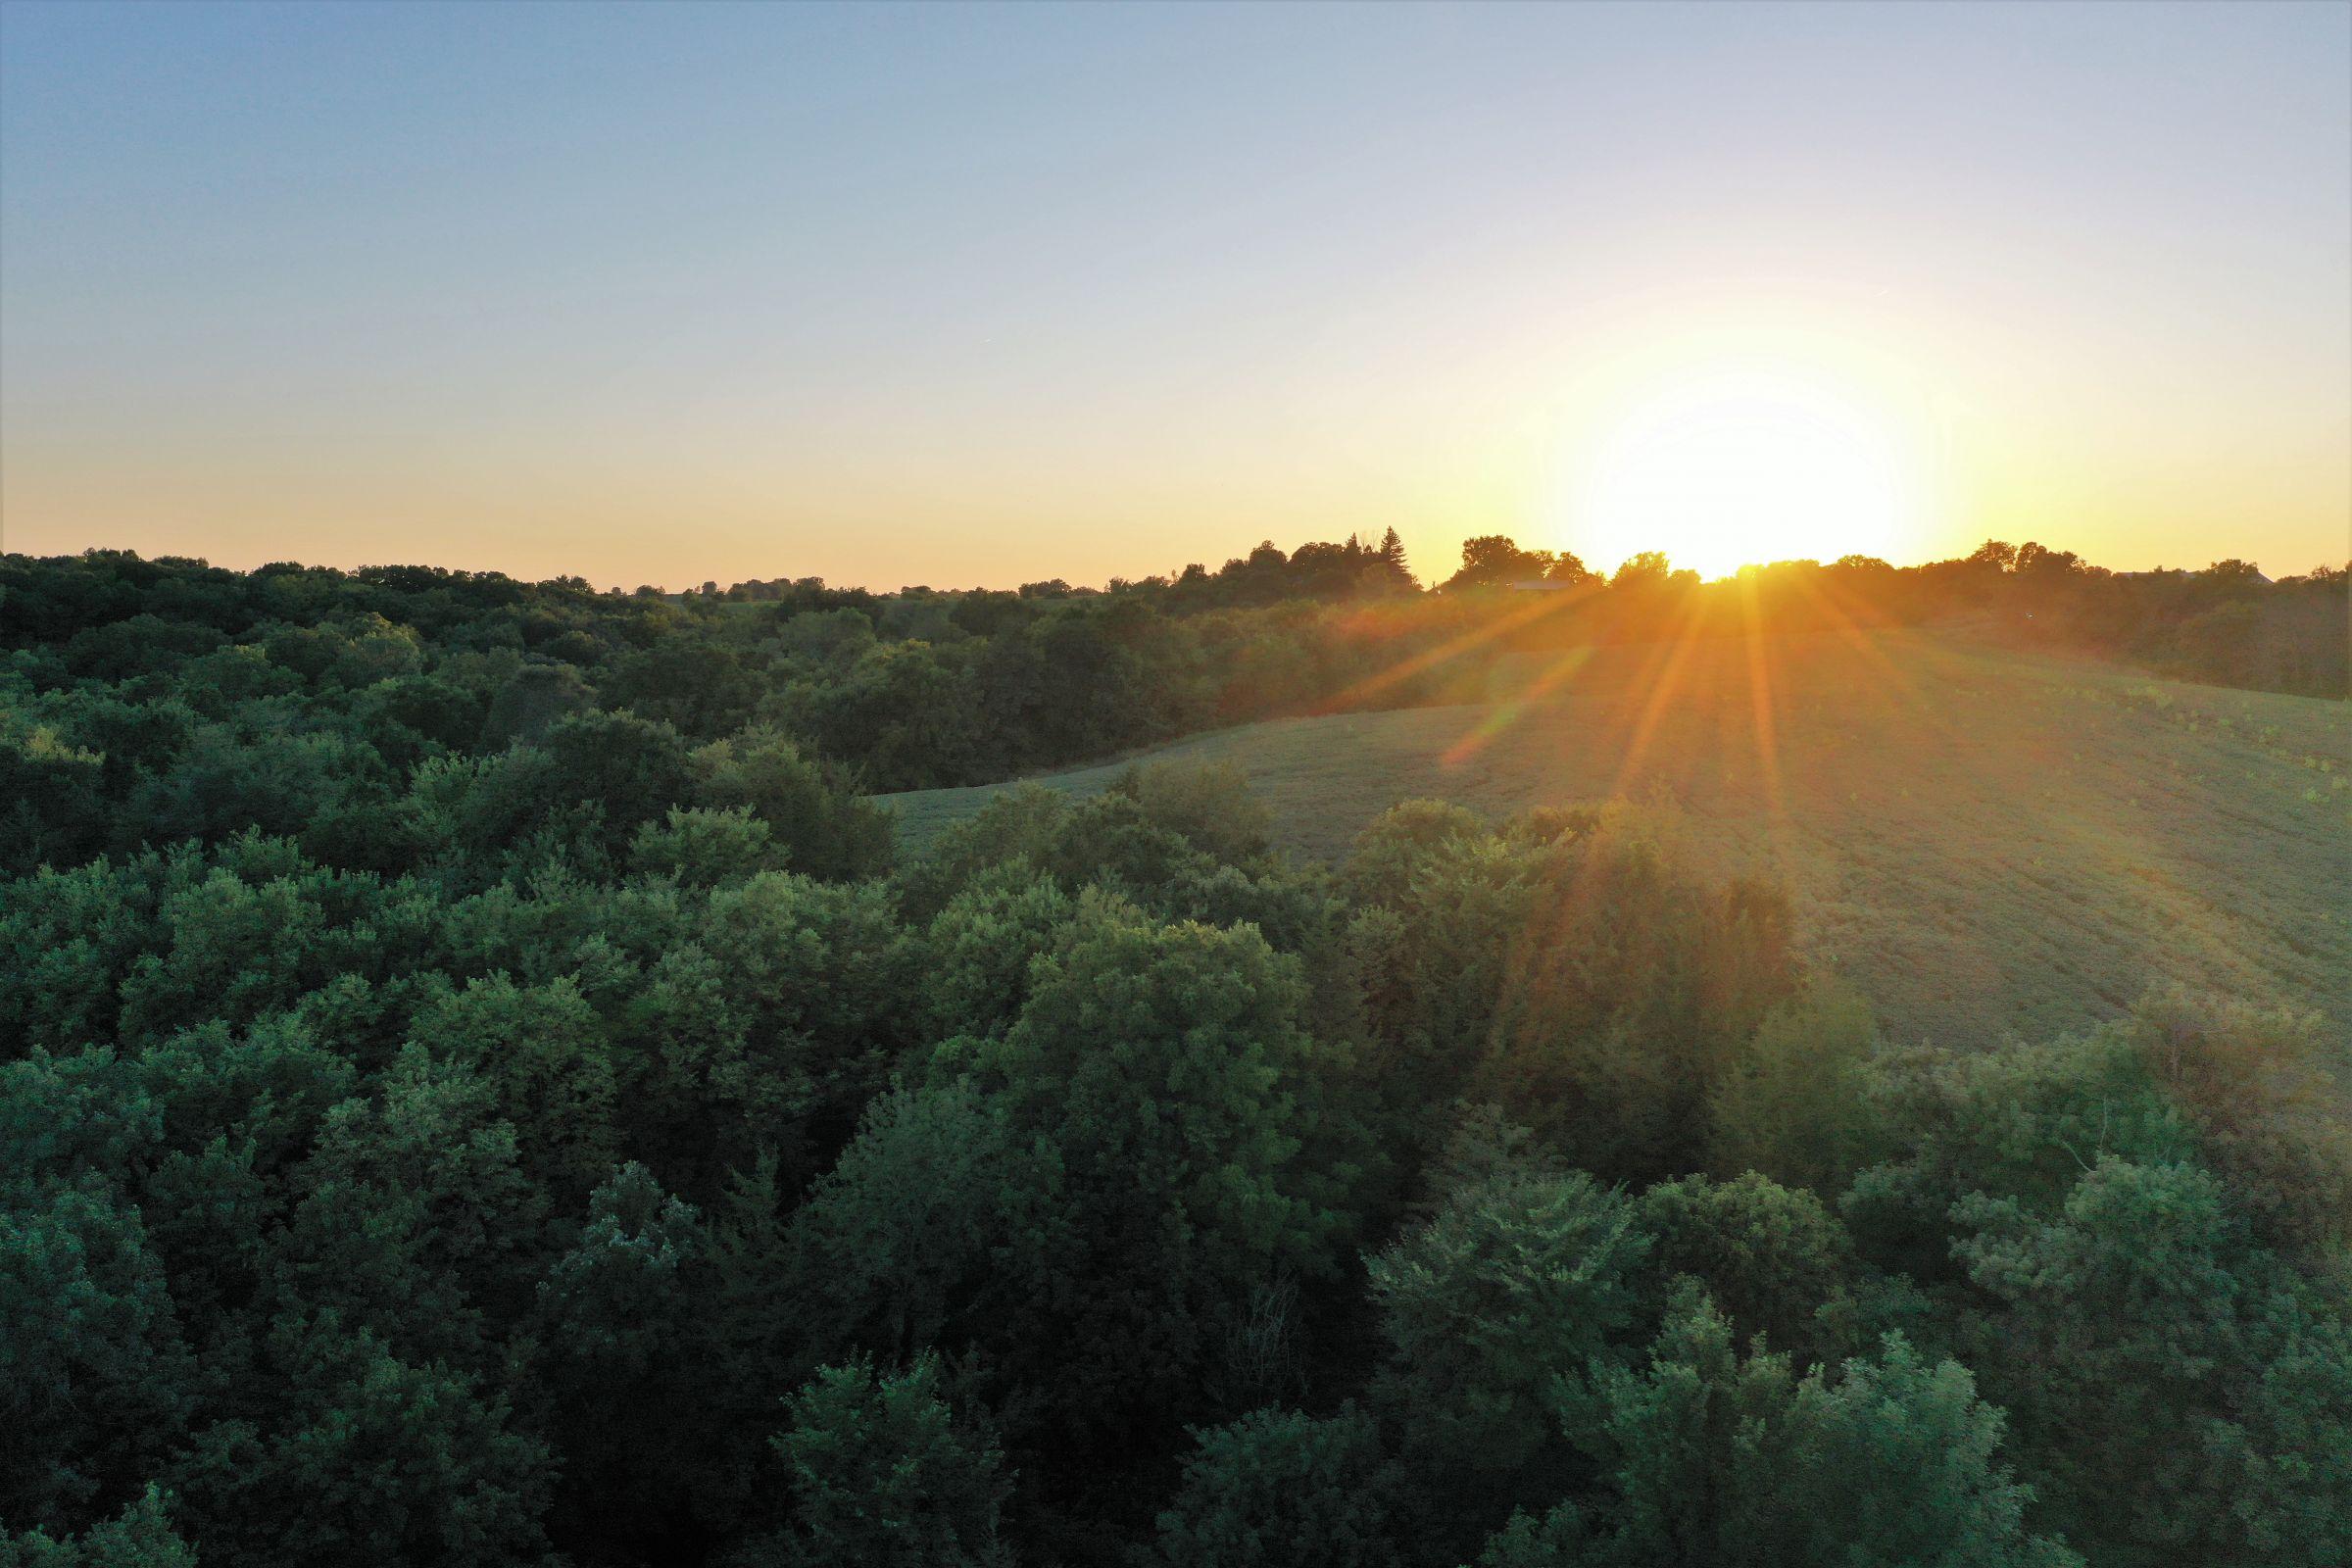 land-clarke-county-iowa-325-acres-listing-number-15416-4-2021-03-18-163317.JPG